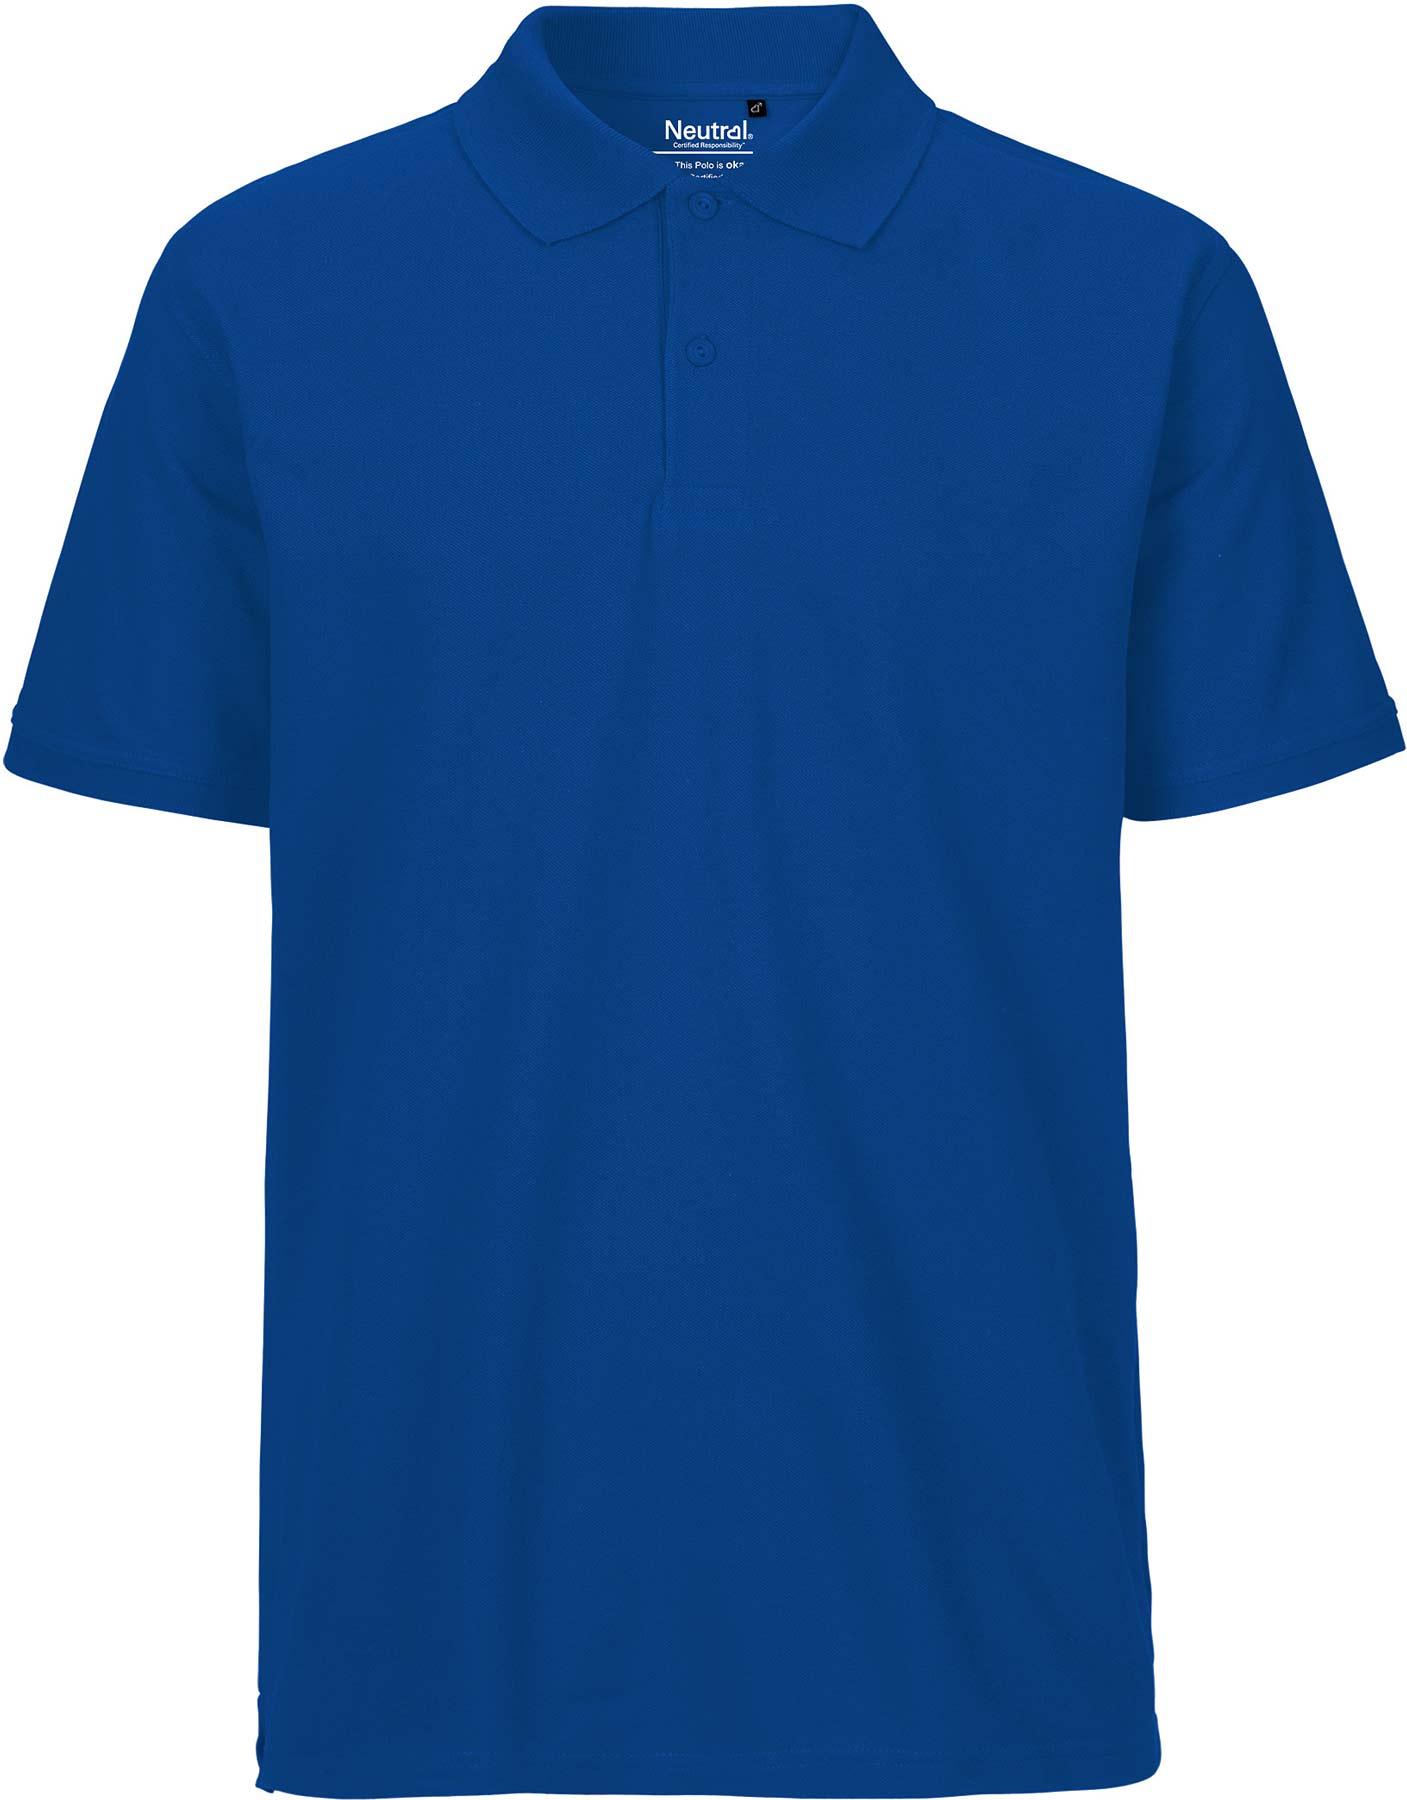 best service 935a3 99d81 Classic Polo-Shirt aus Fairtrade Bio-Baumwolle - royal blue